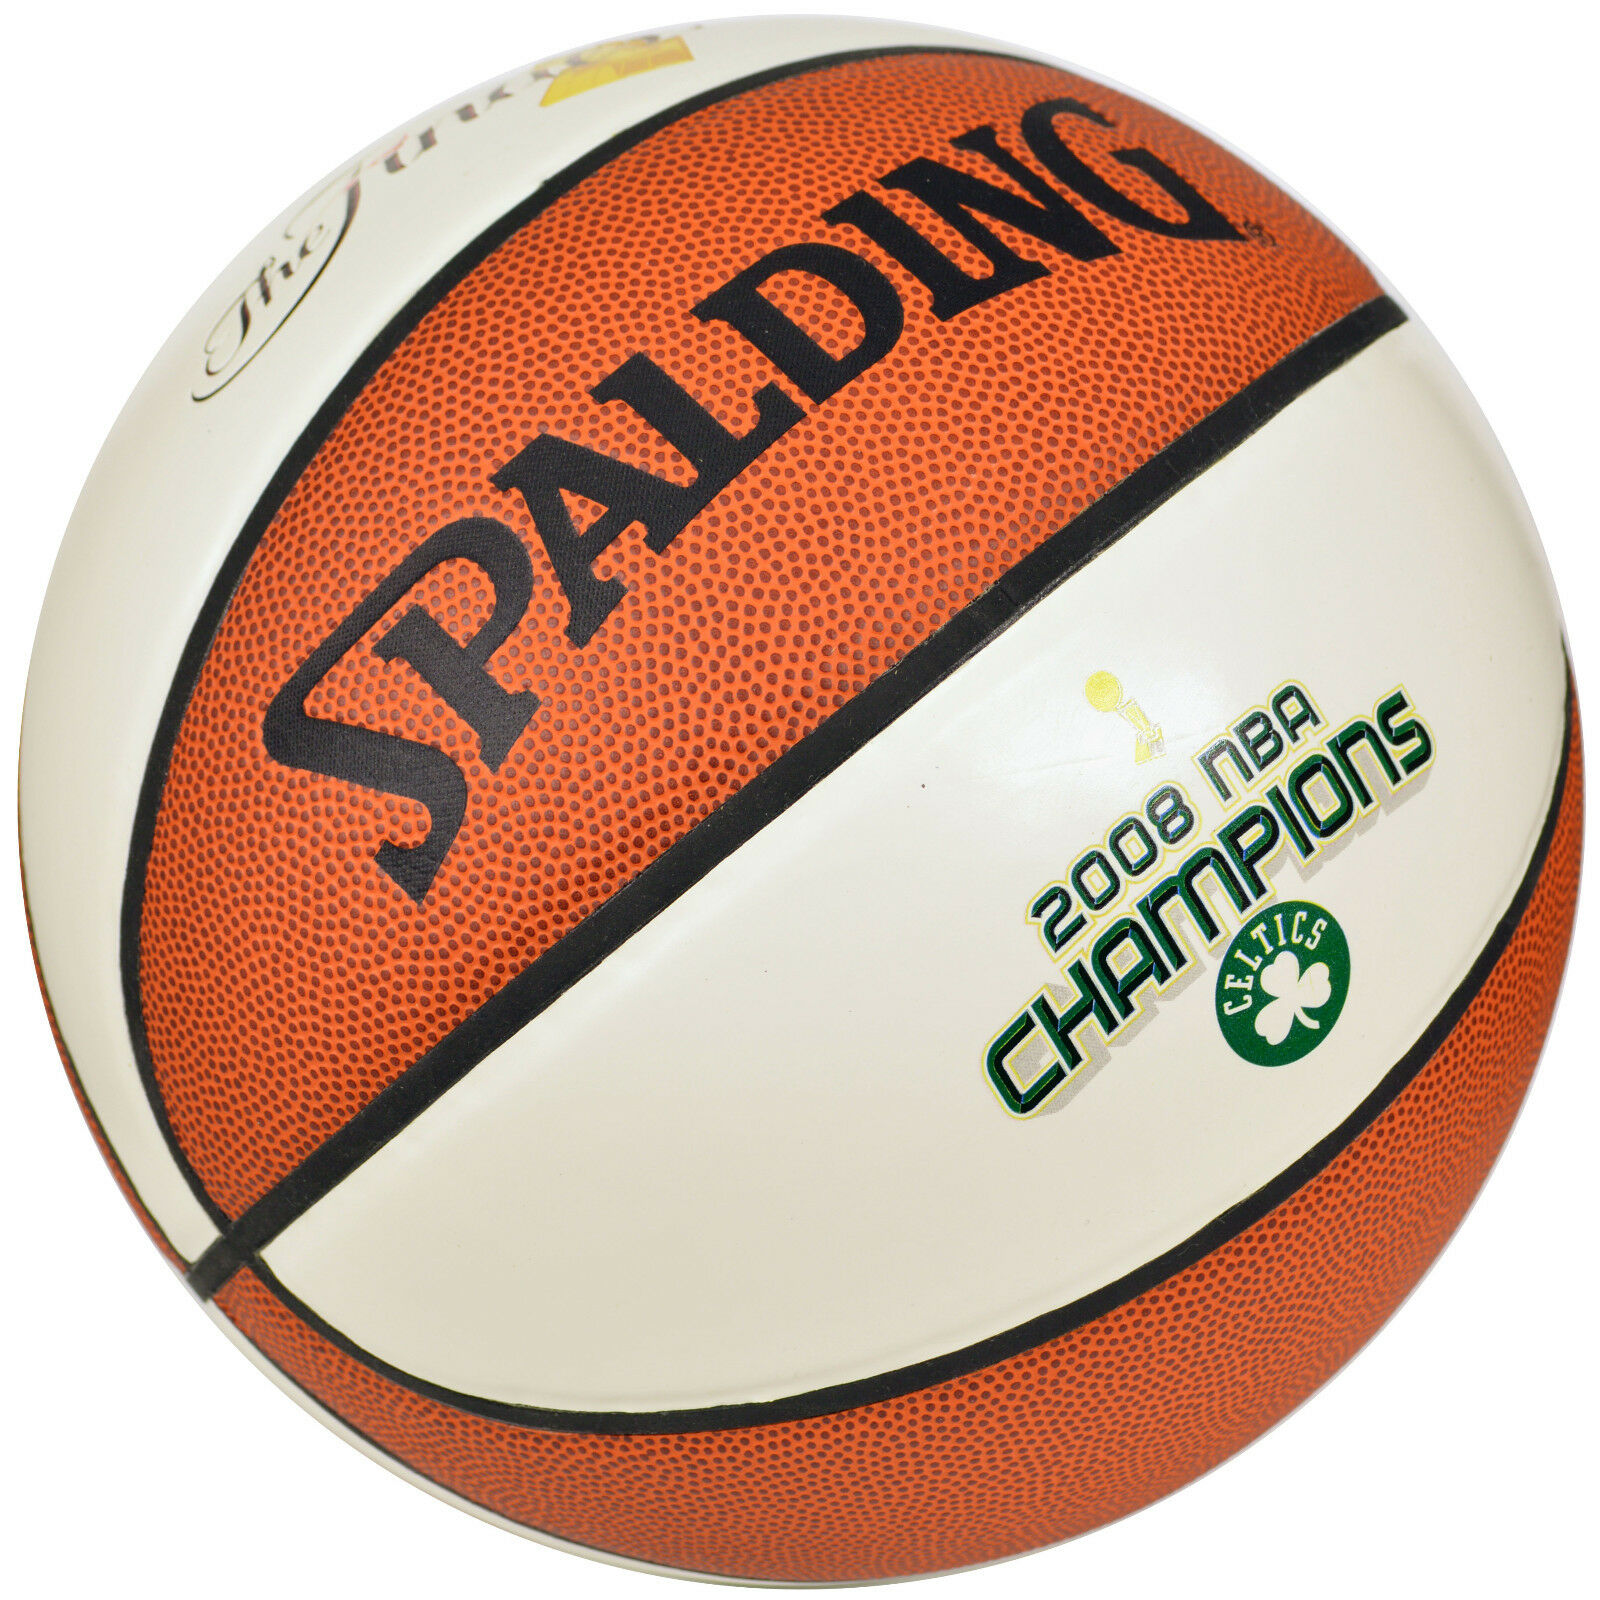 SPALDING THE FINALS BOSTON CELTICS 2008 NBA CHAMPIONS BASKETBALL